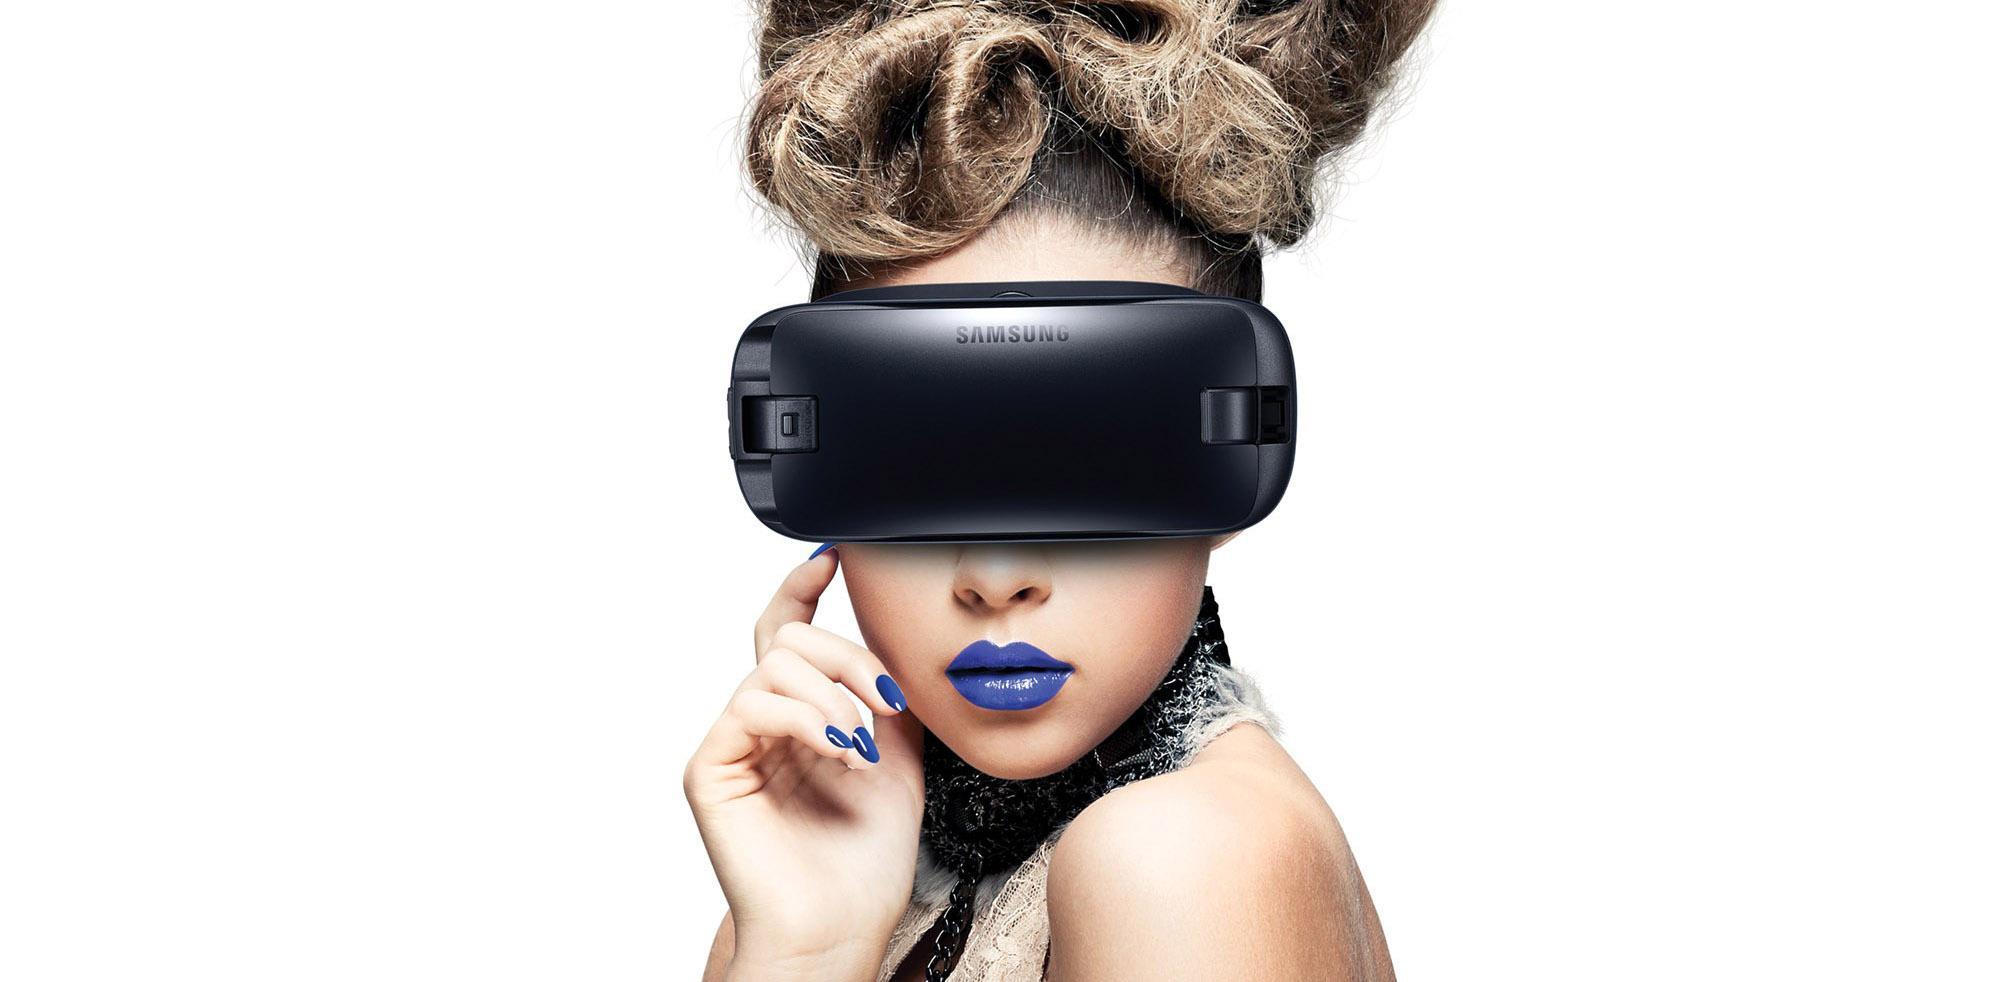 Samsung VR headset - AR VR design